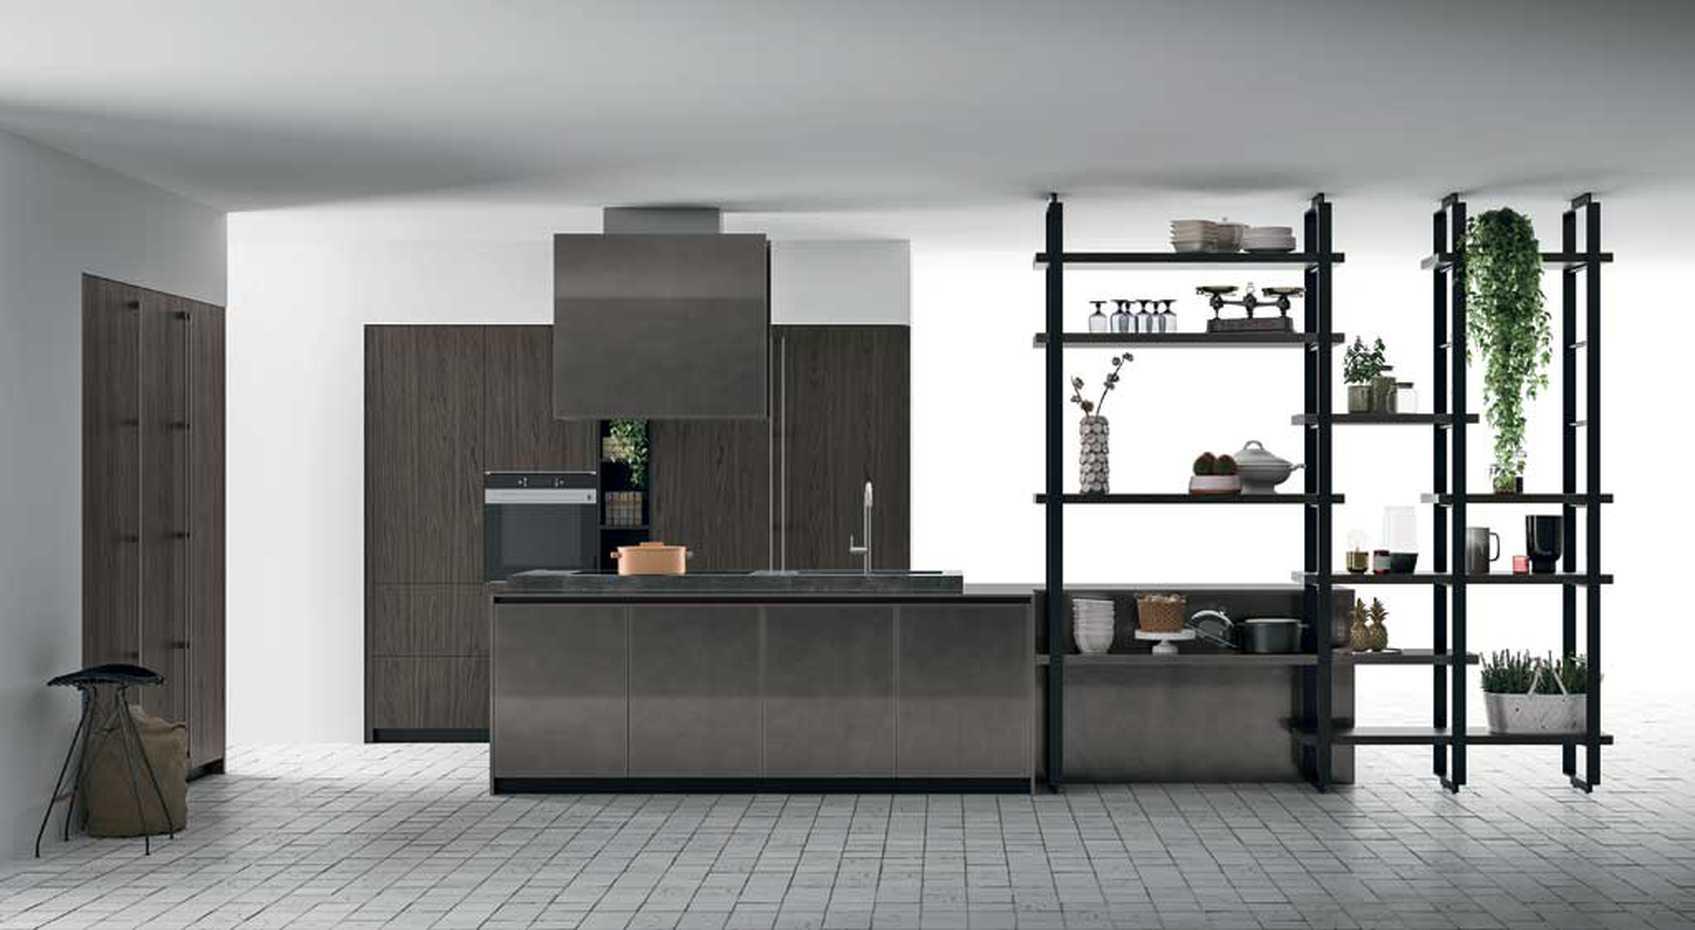 SoHo by Doimo Cucine product image 1